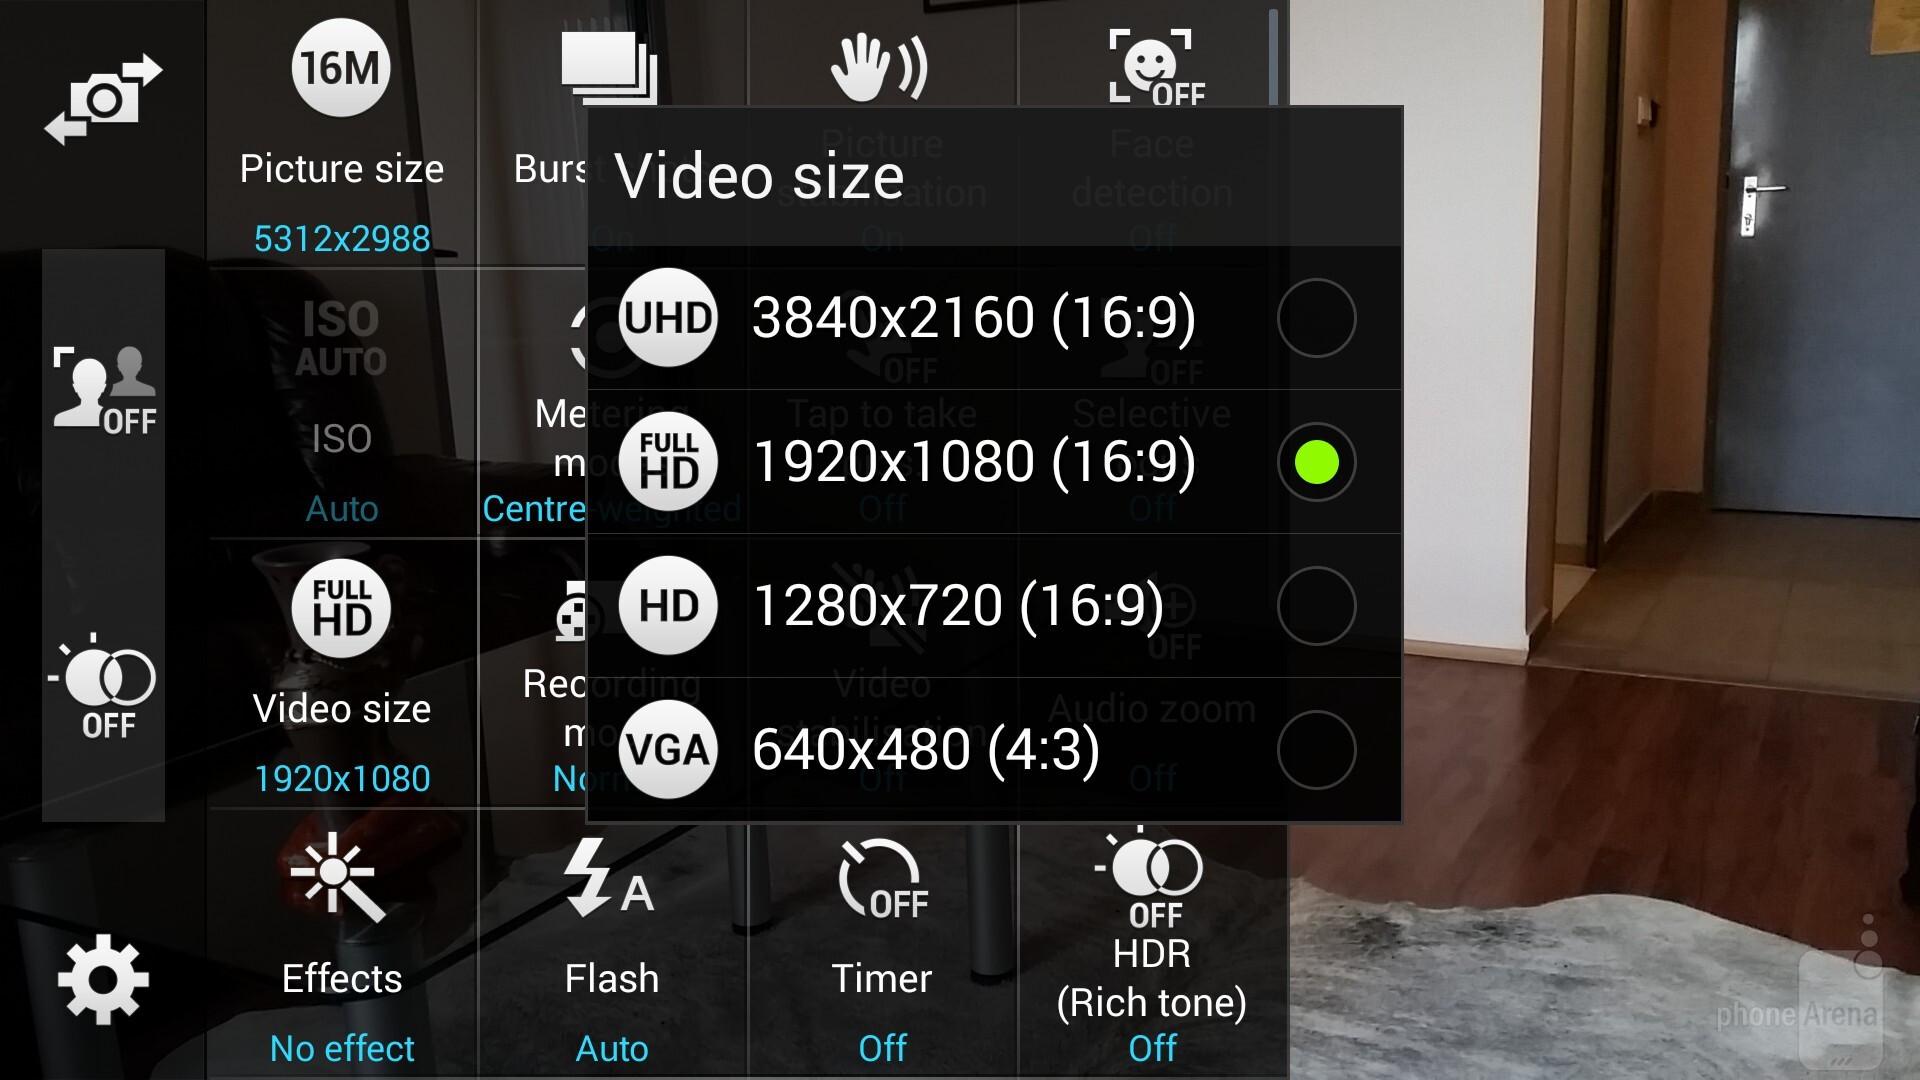 Samsung Galaxy Note 4 vs Samsung Galaxy S5 - Camera and